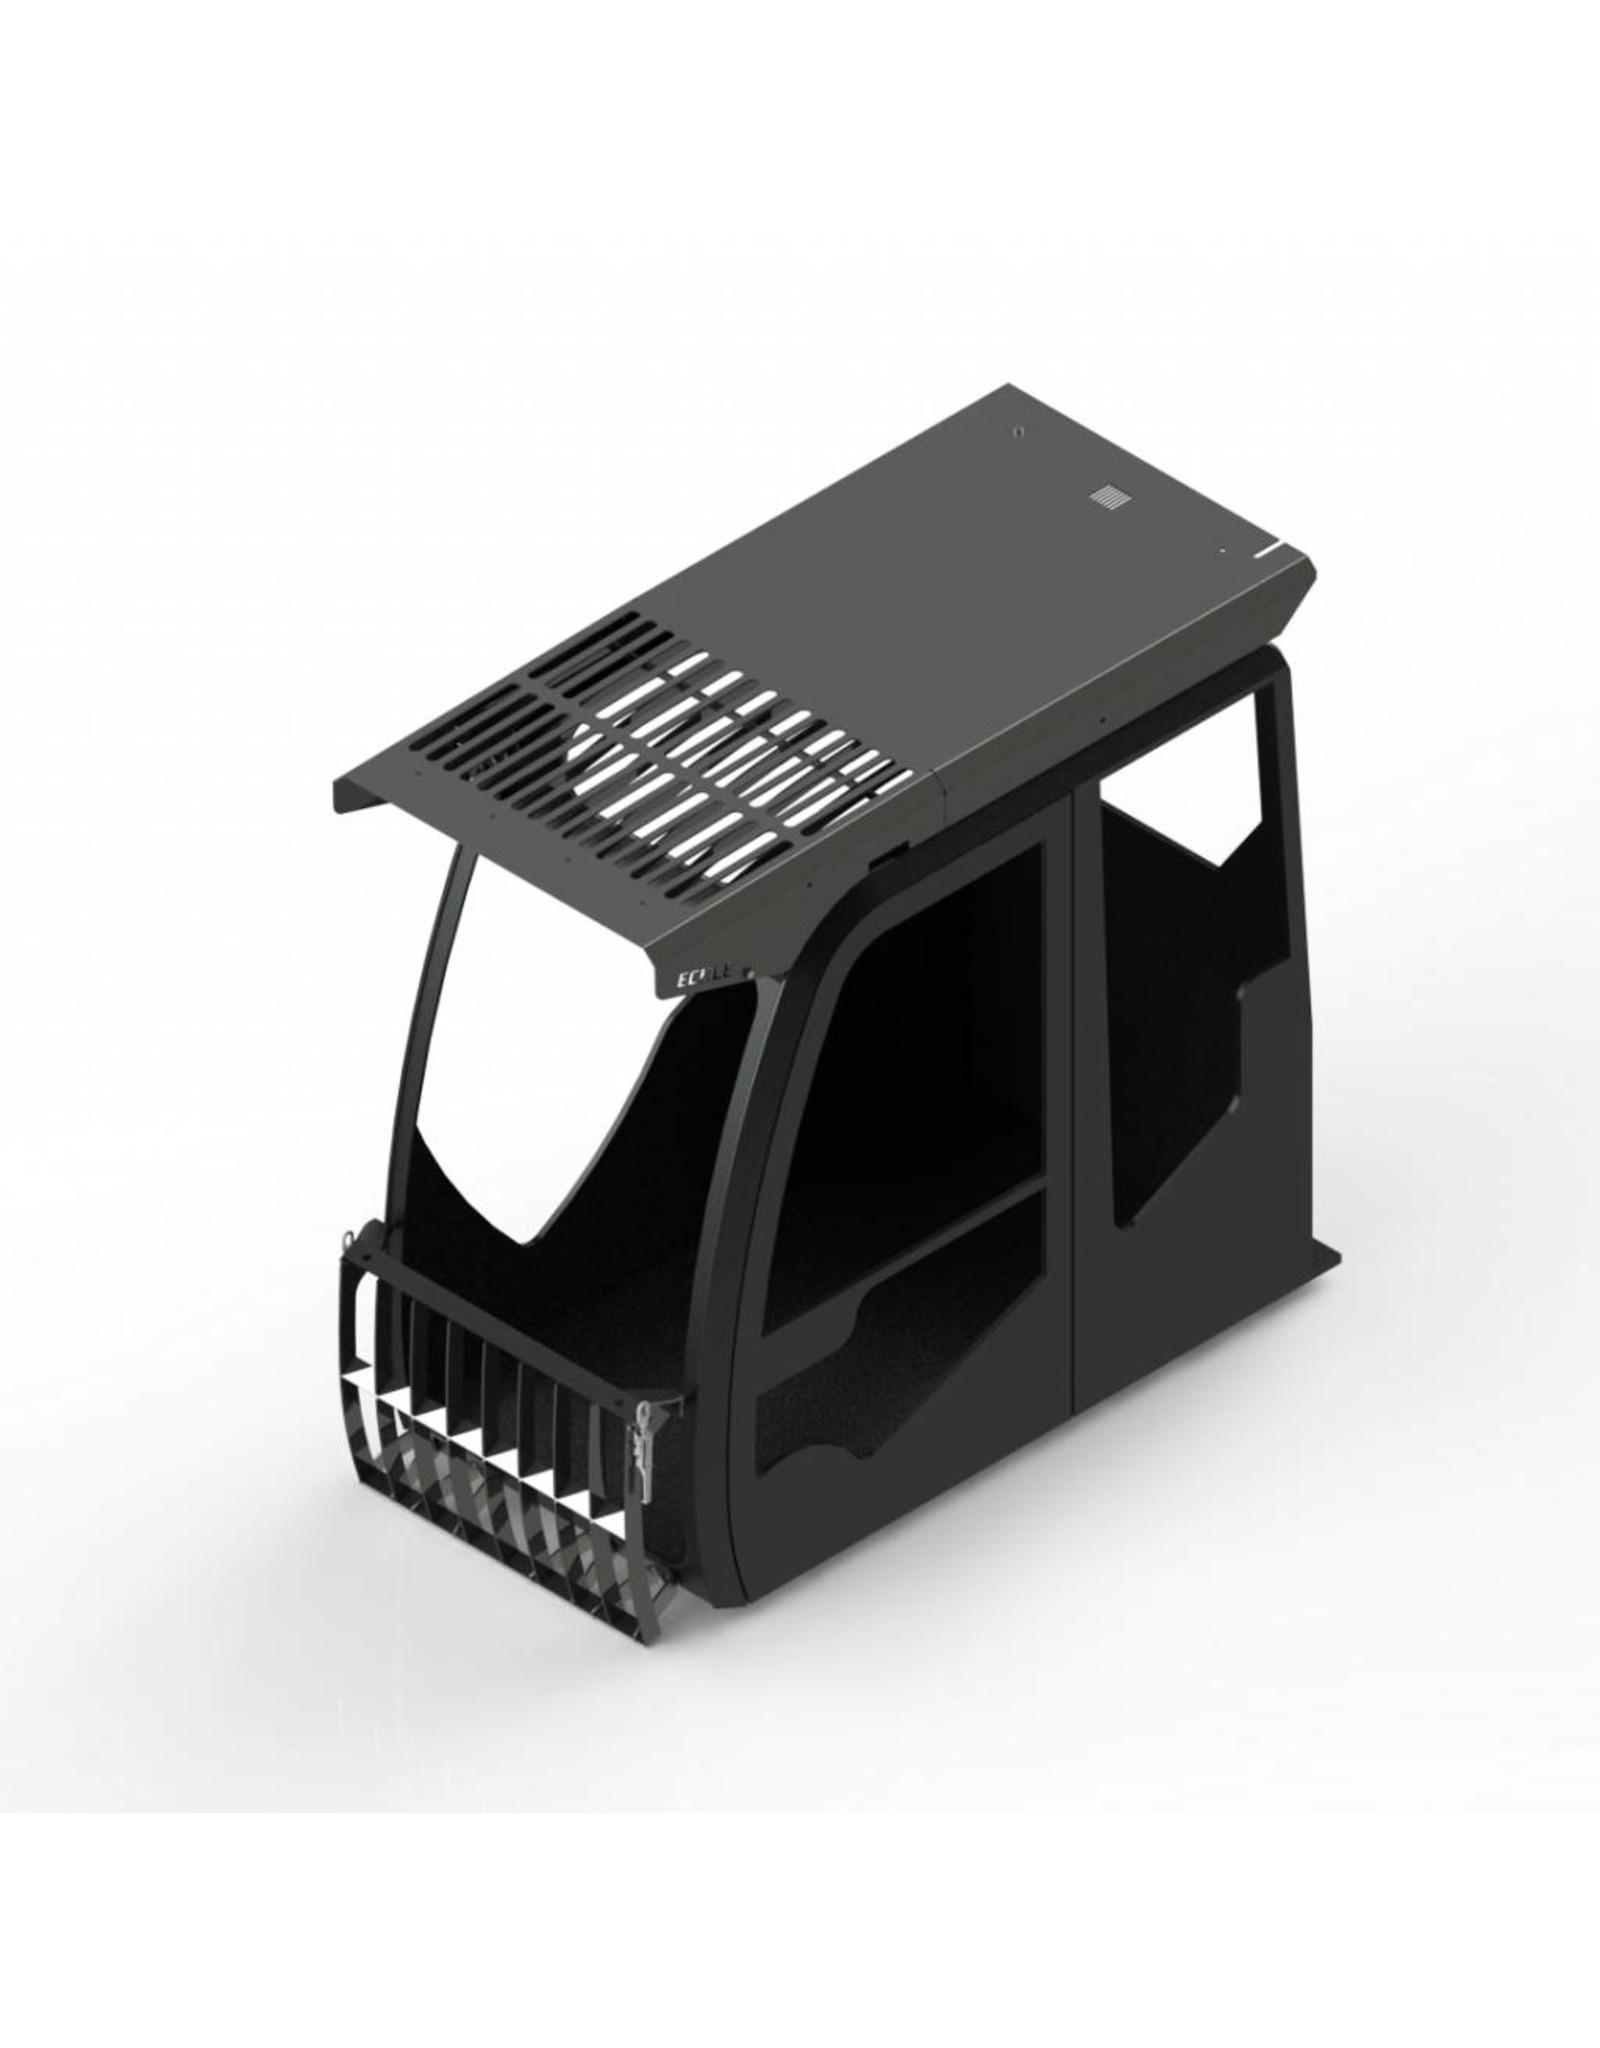 Echle Hartstahl GmbH FOPS für Hyundai HW140